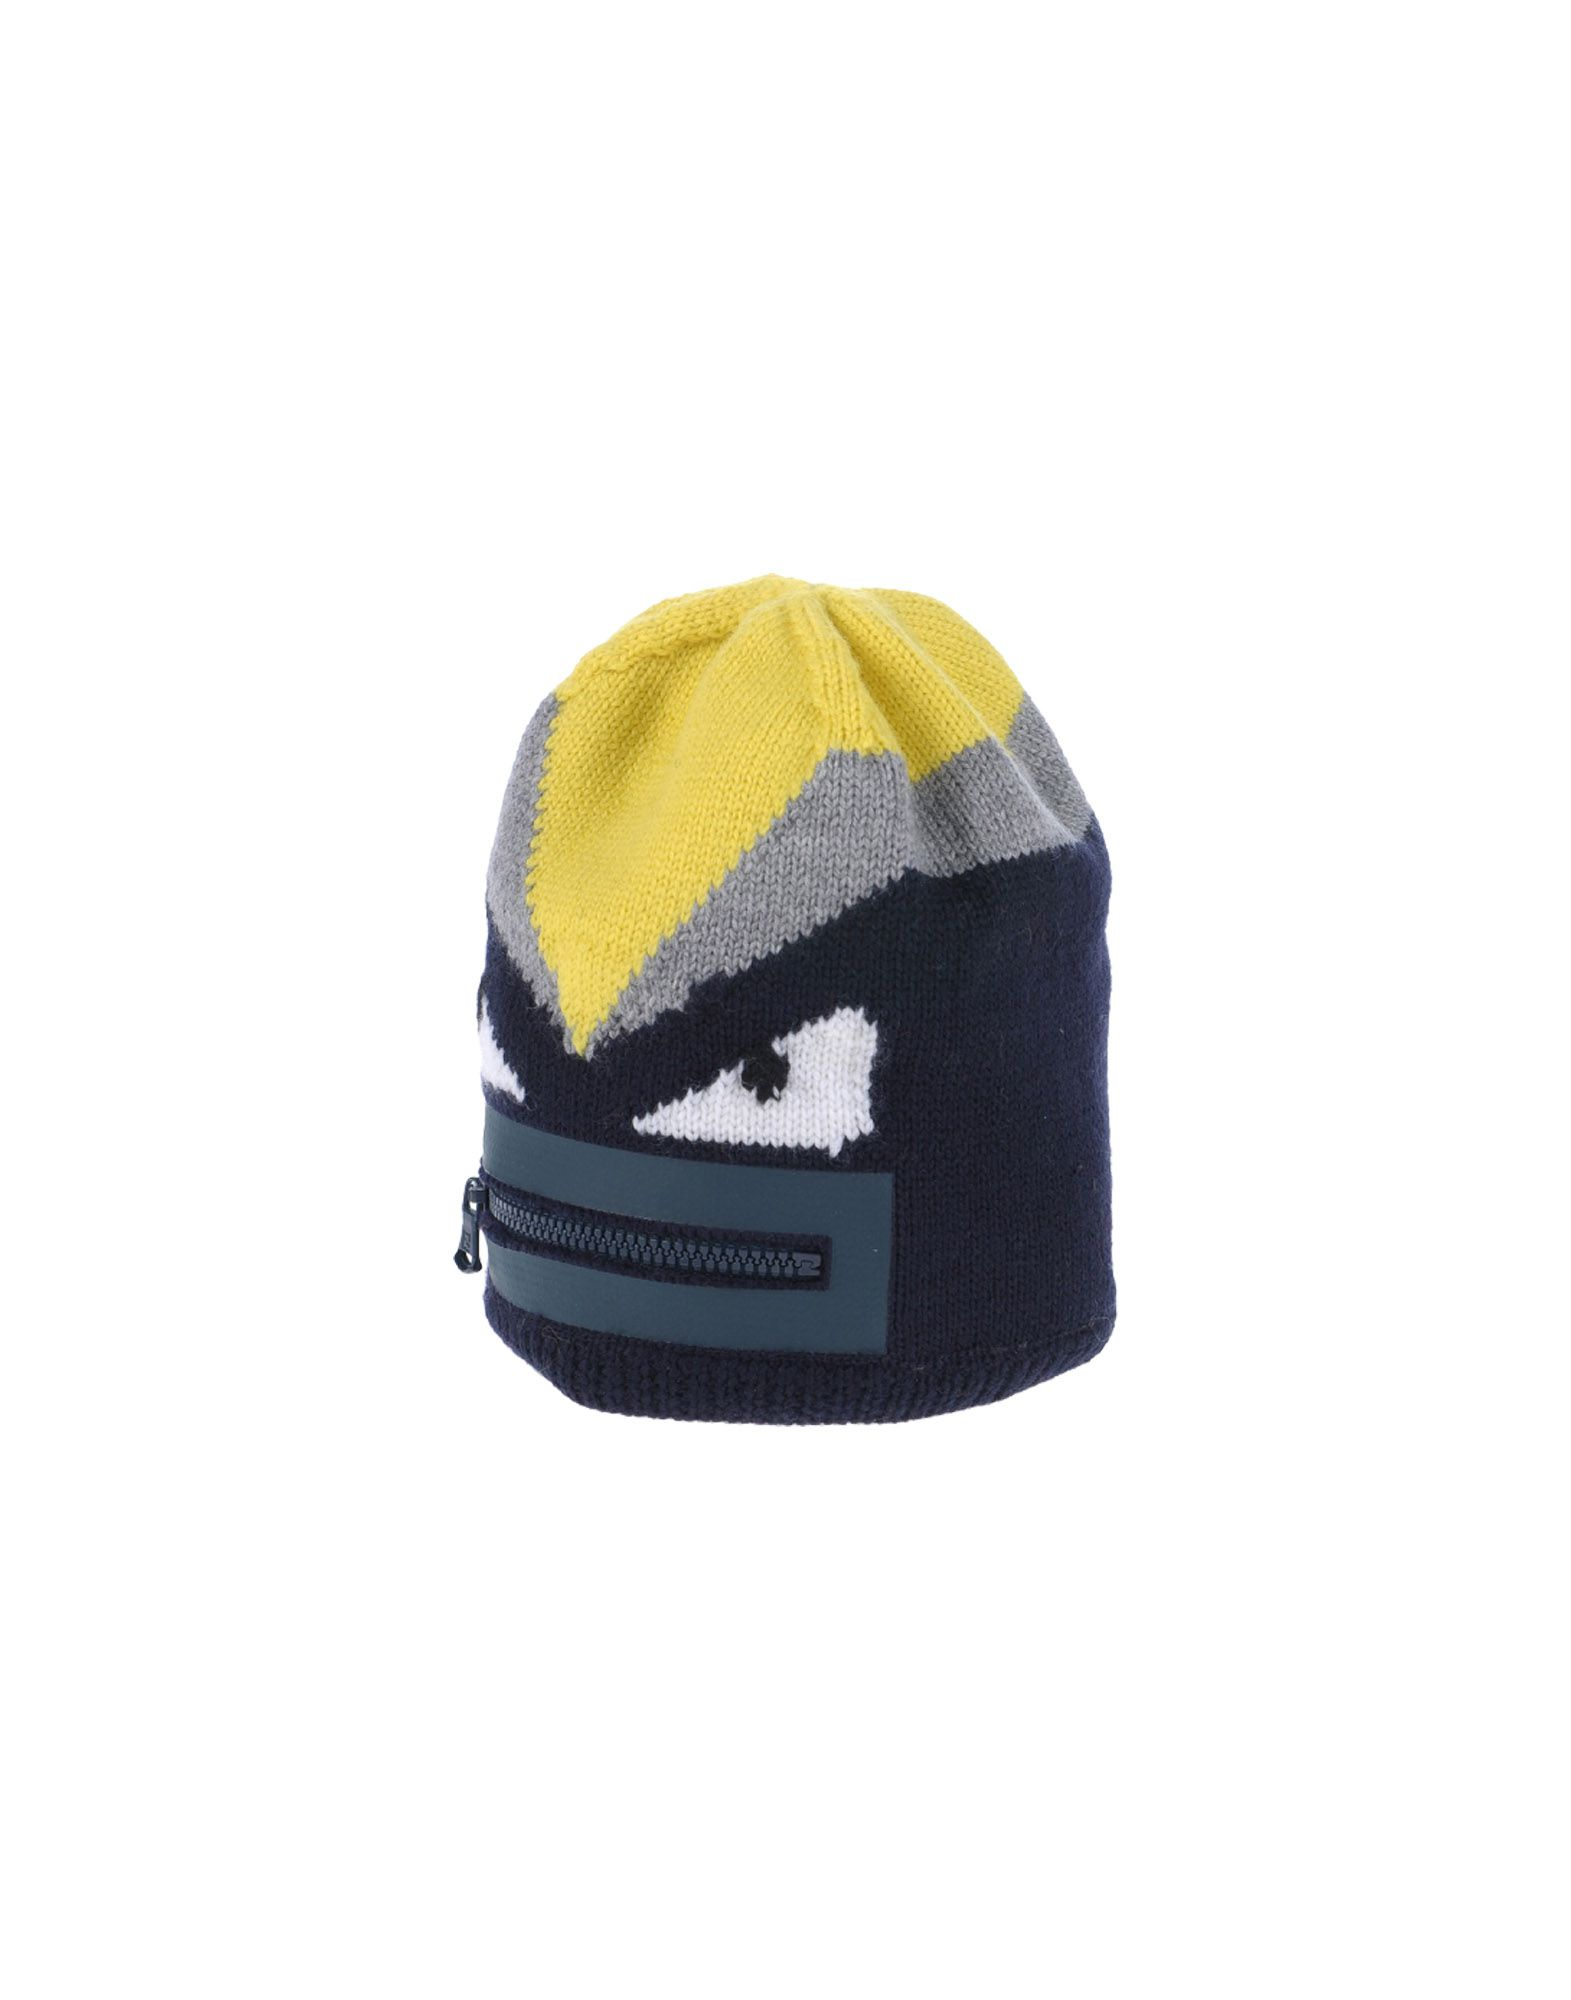 Fendi  Monster Baby Beanie Hat · Stush Fashionista · Online Store ... d4fdefe11b3